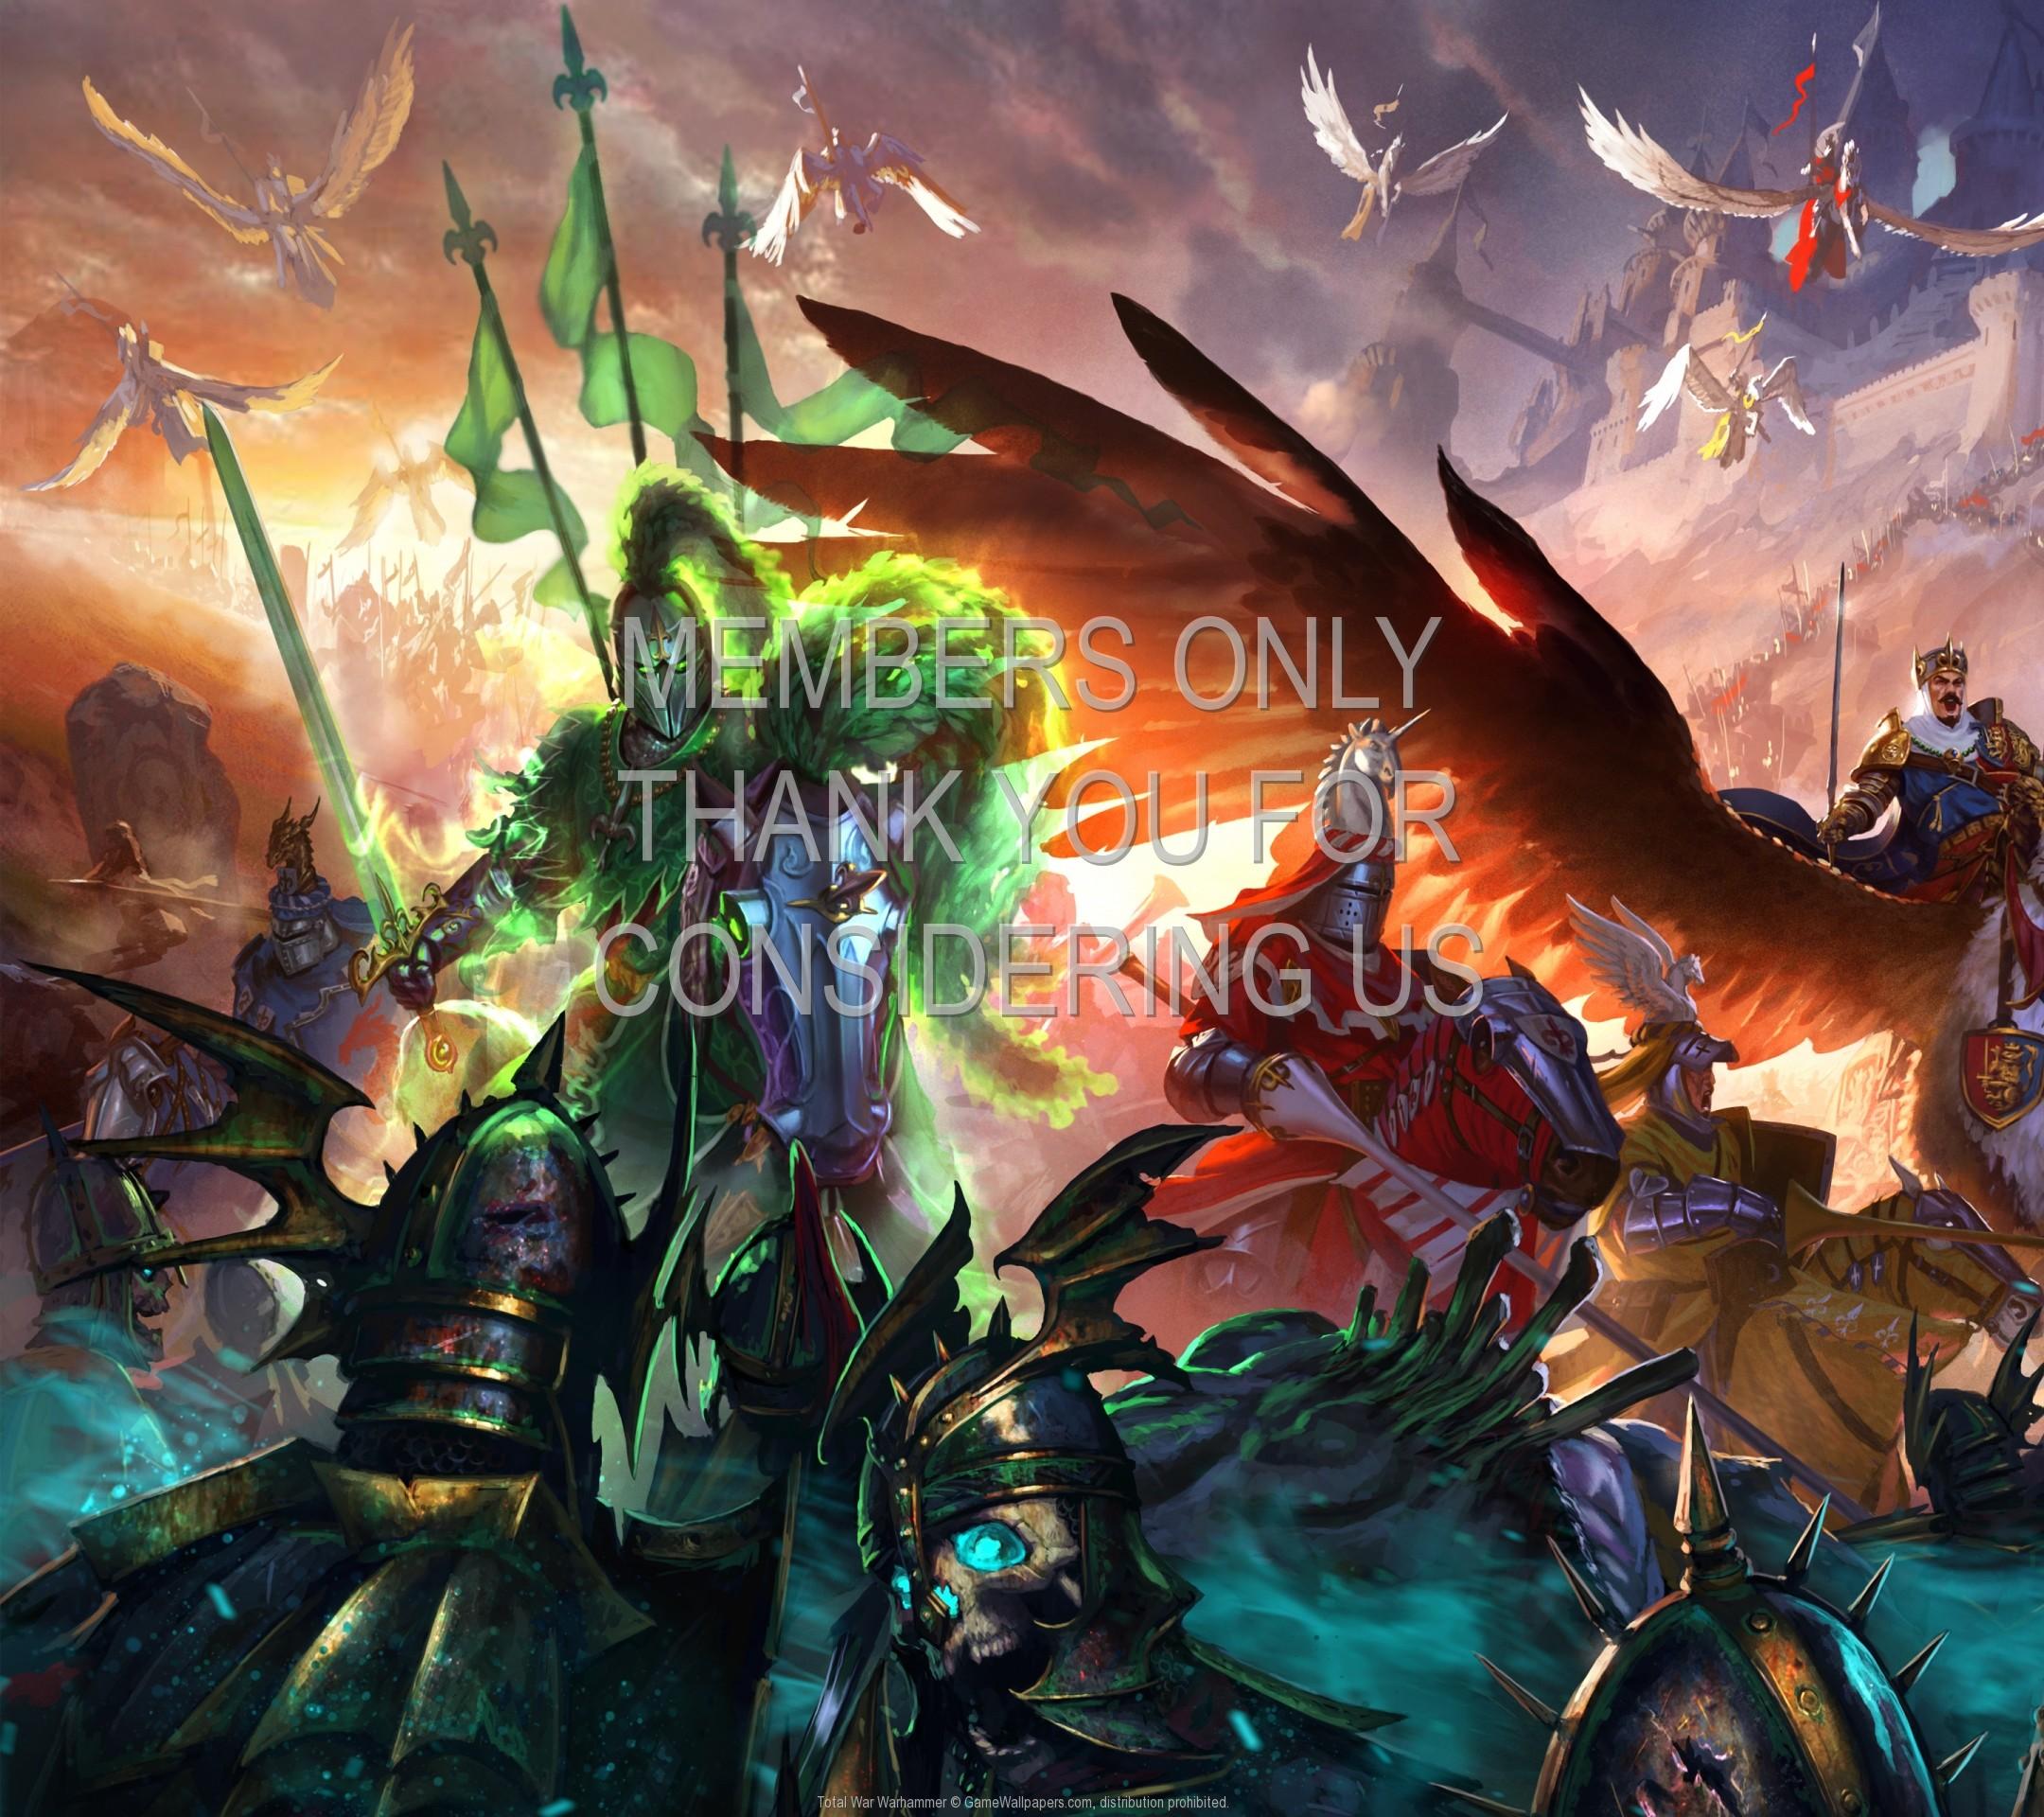 Total War: Warhammer 1920×1080 Mobile wallpaper or background 06